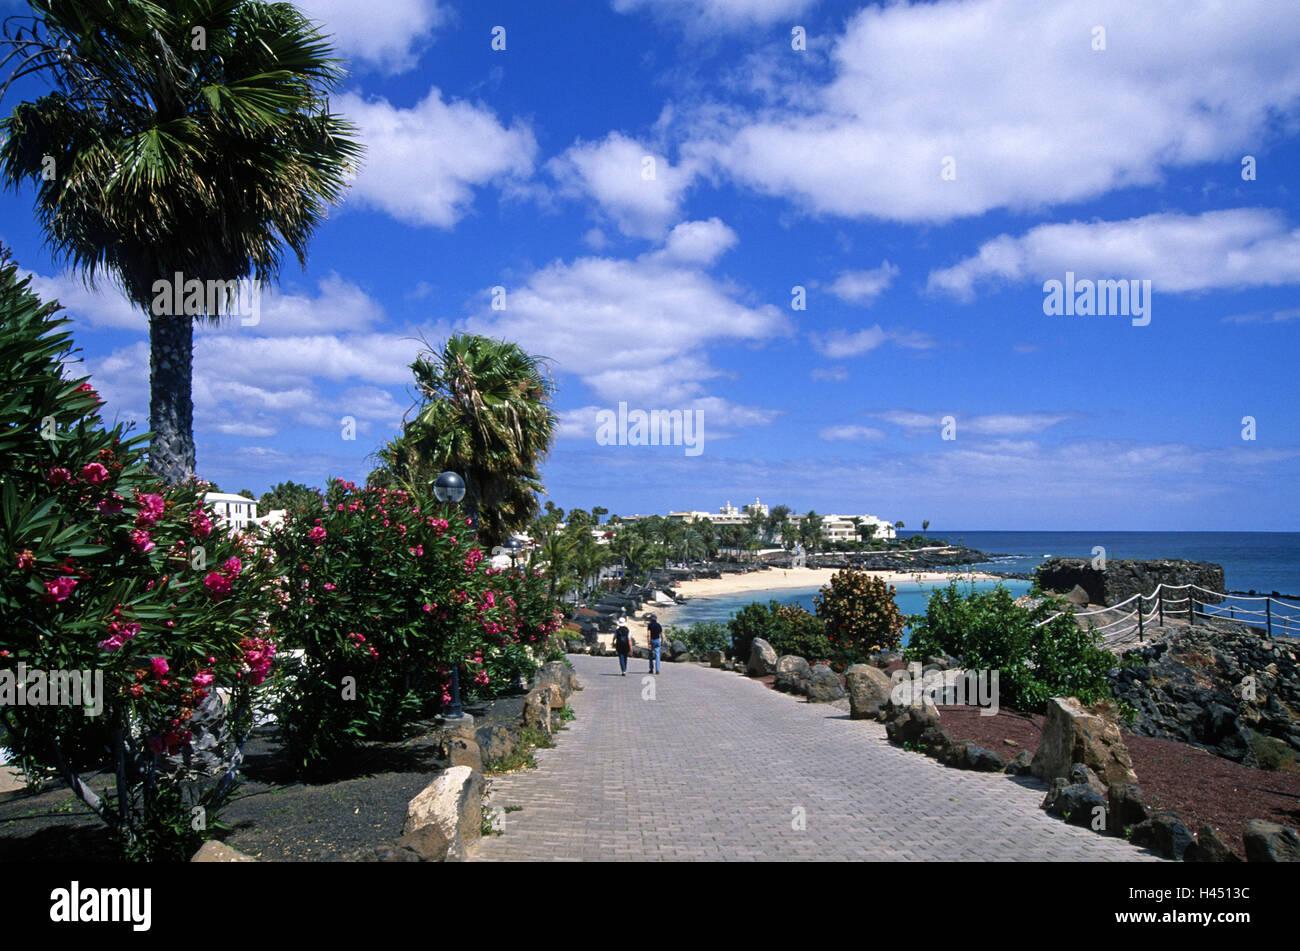 Spain, the Canaries, island Lanzarote, Playa Blanca, way, - Stock Image